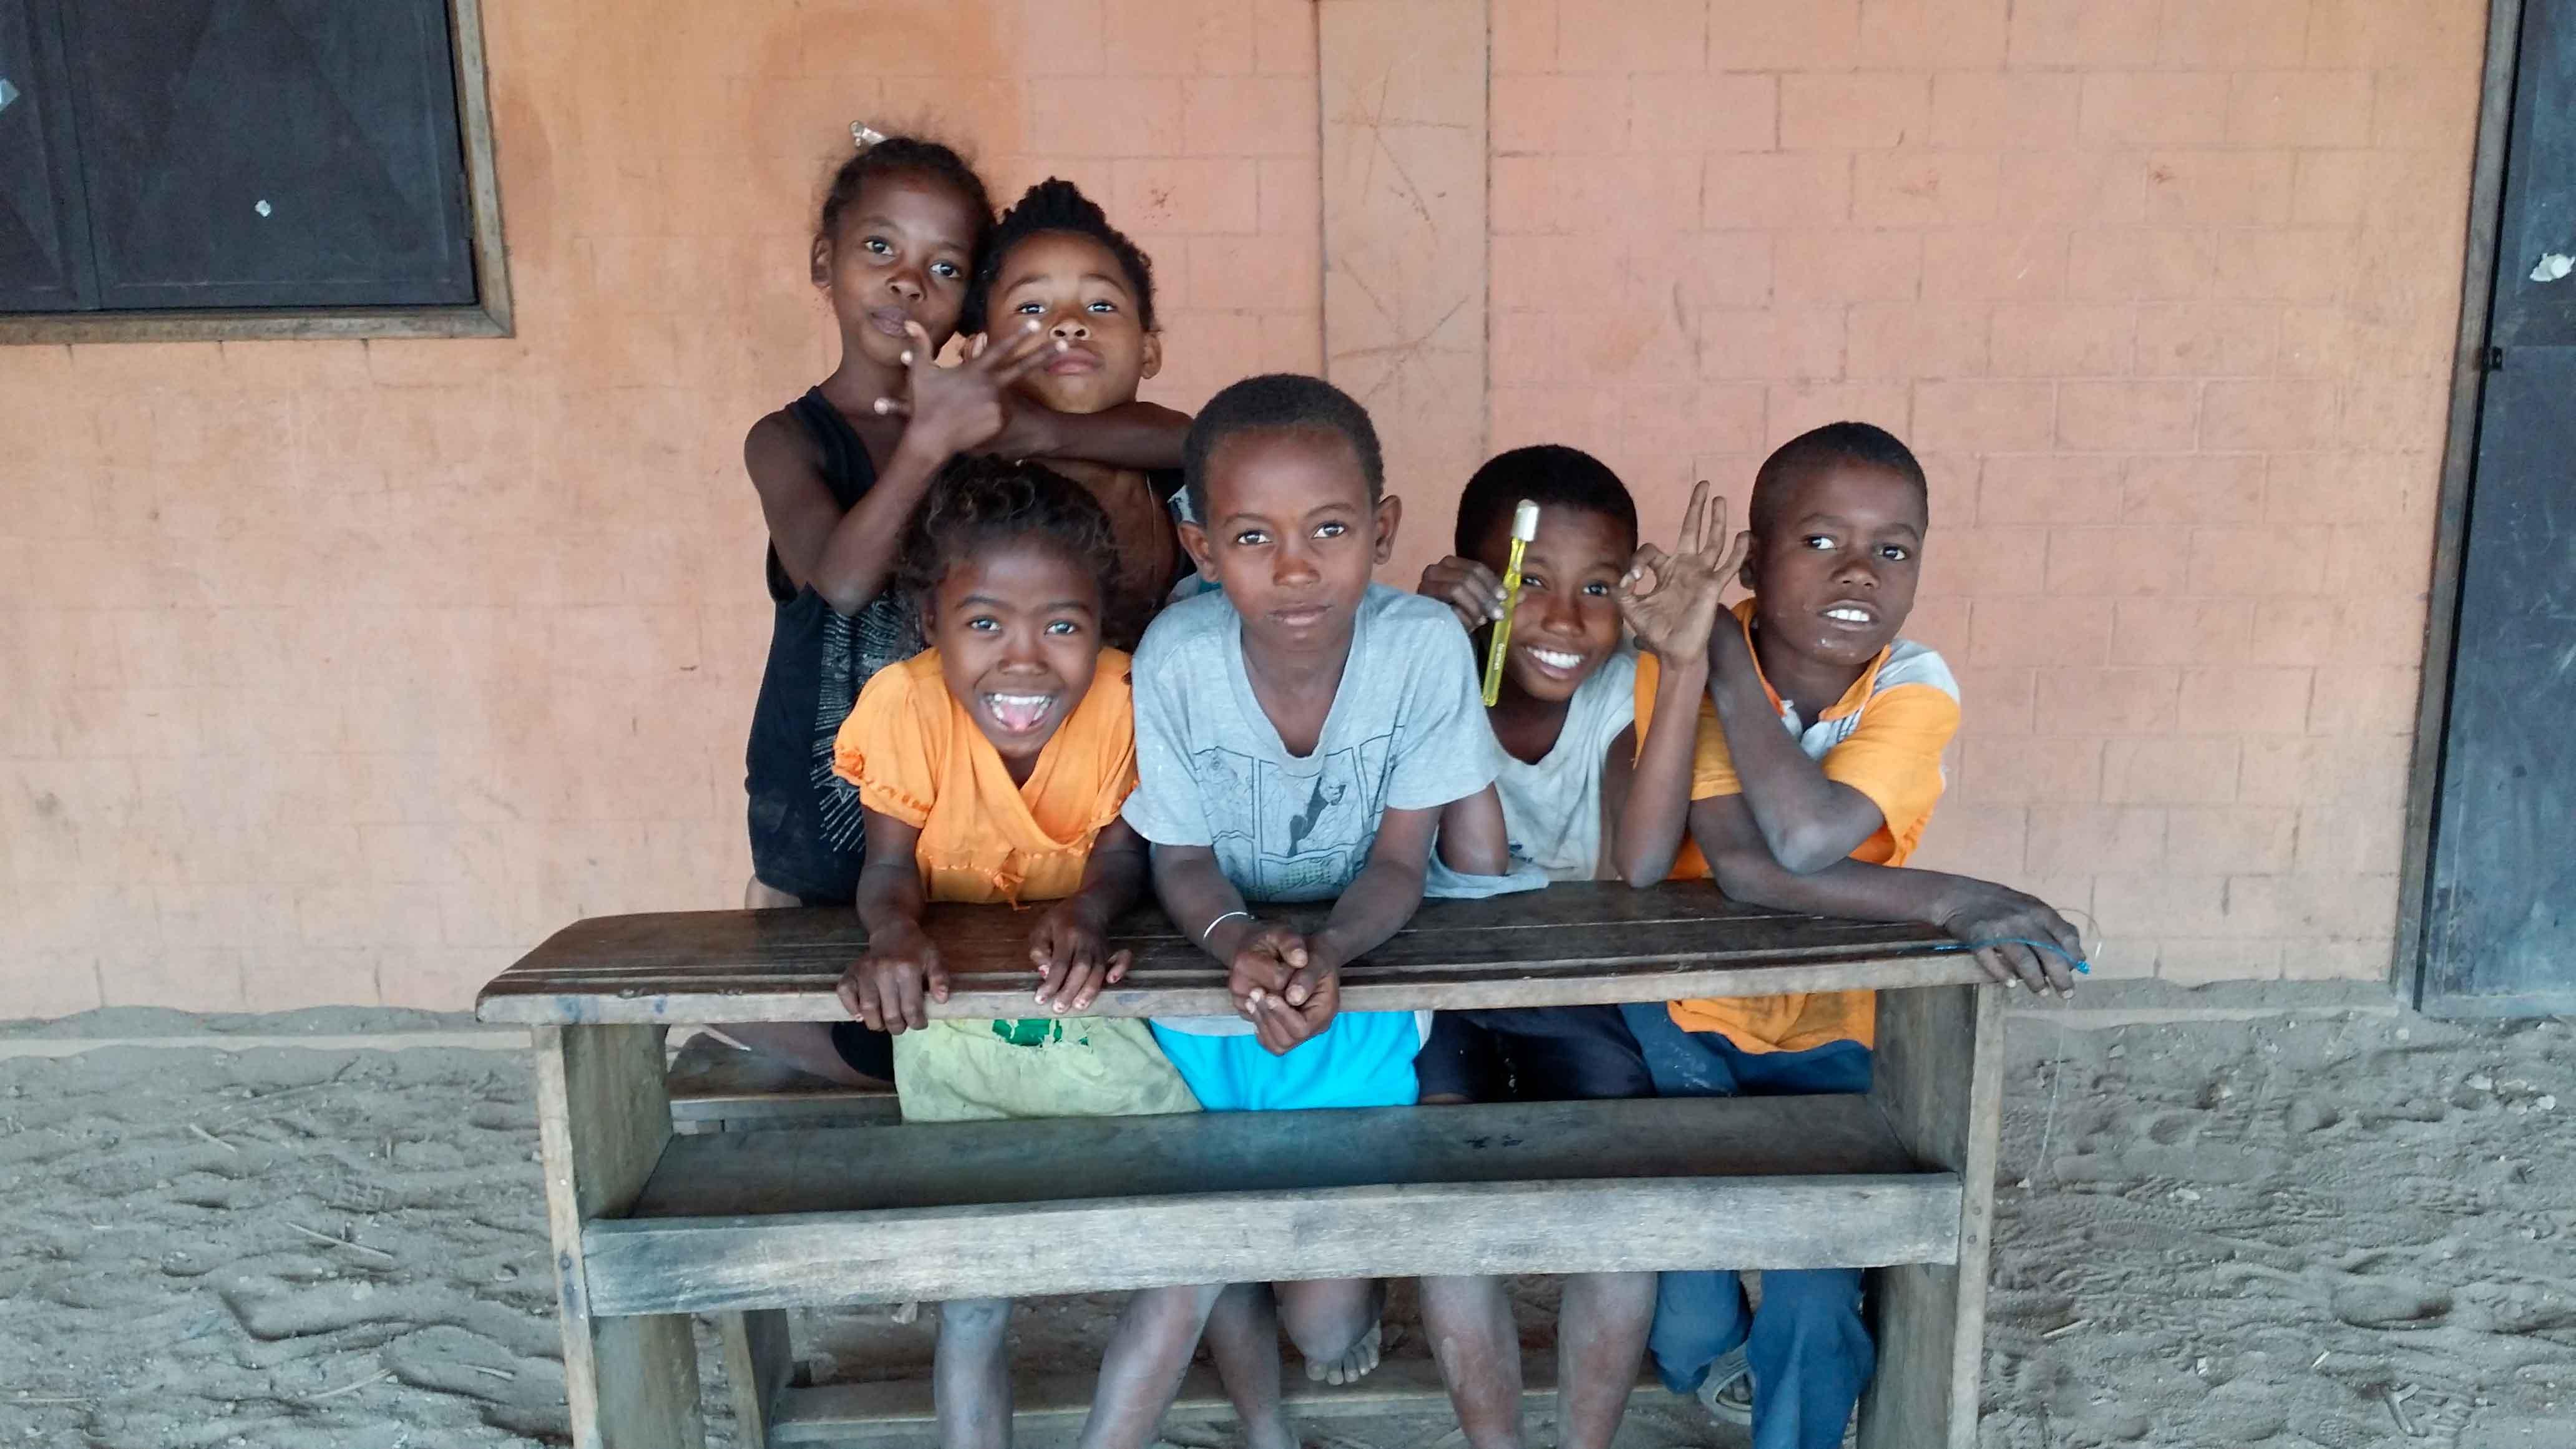 groupe enfants populations indigentes